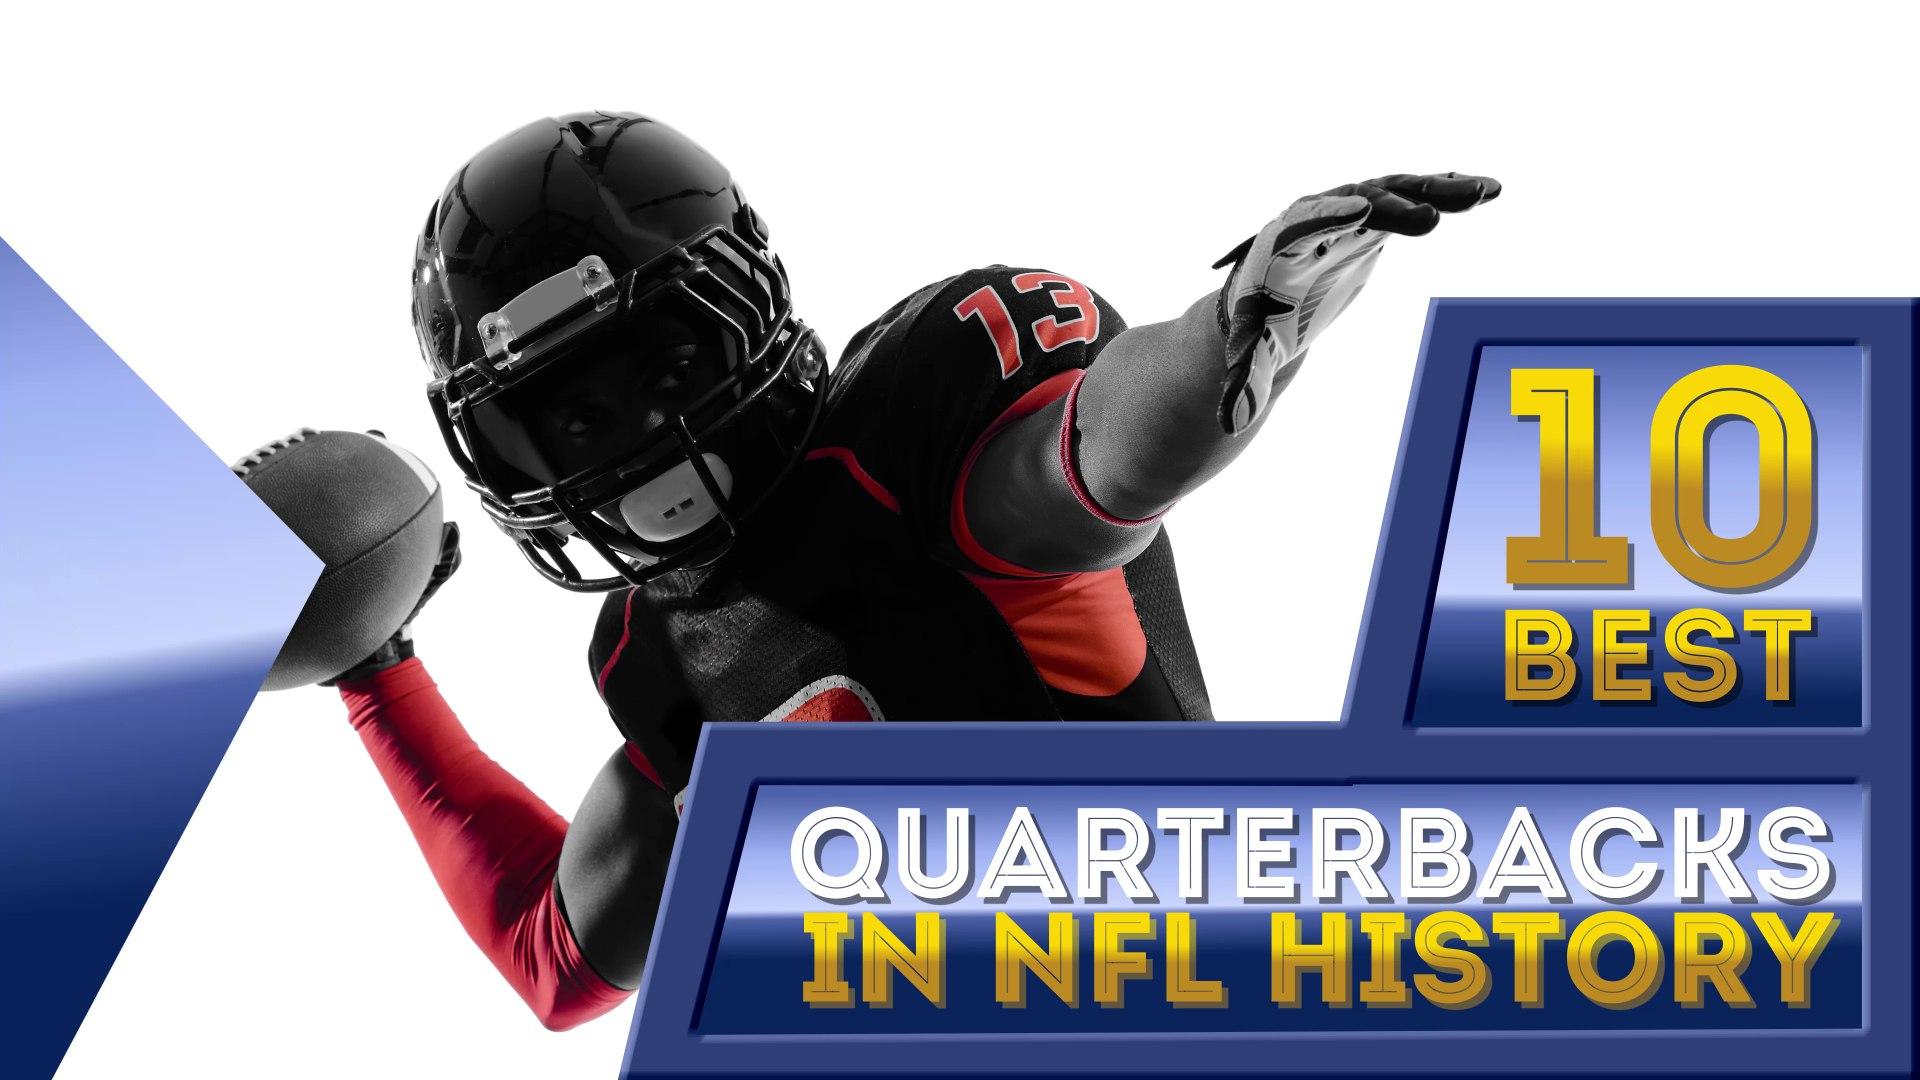 10 Best Quarterbacks in NFL History